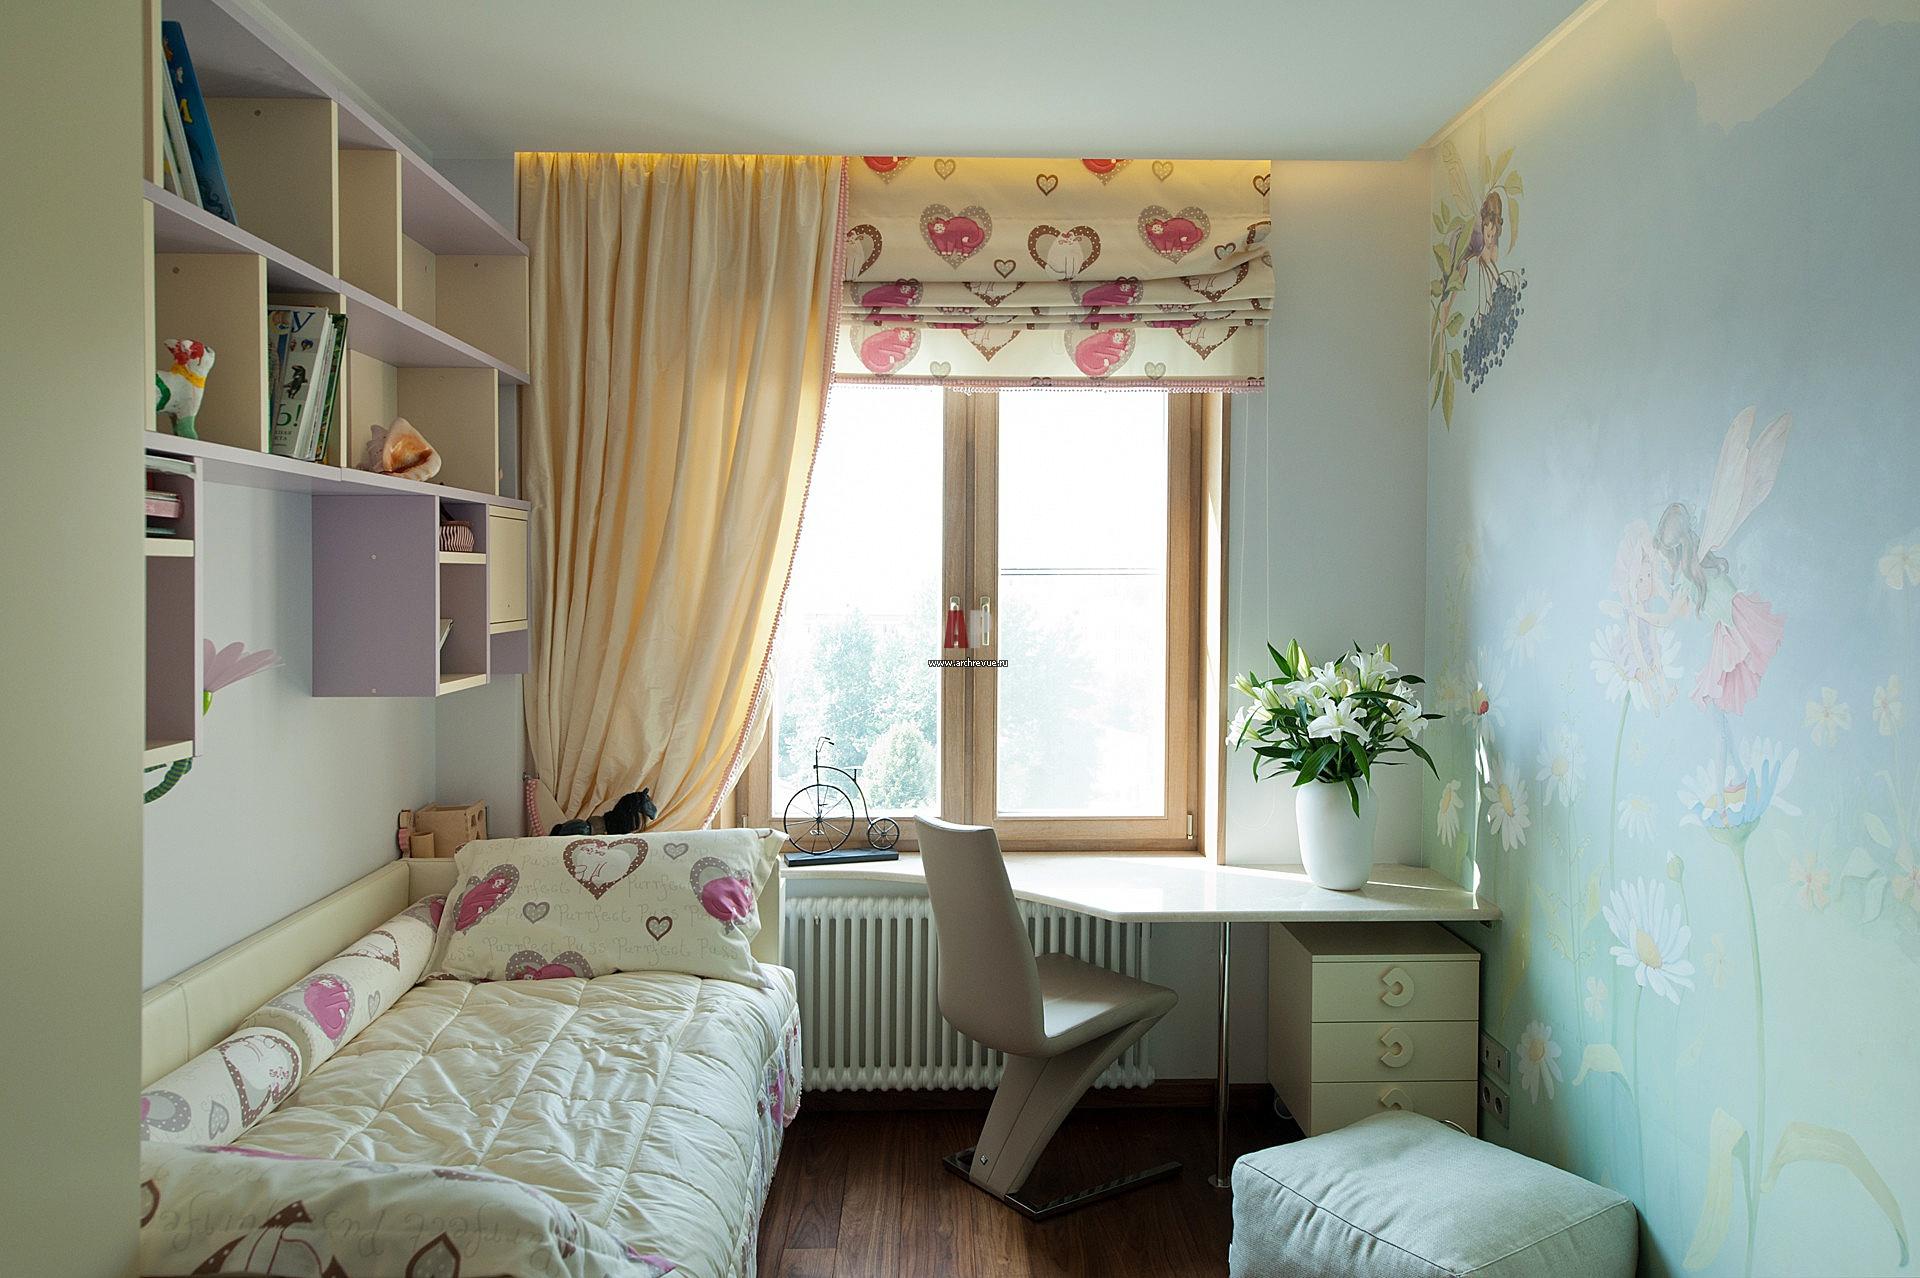 Детская комната 8 кв м дизайн фото